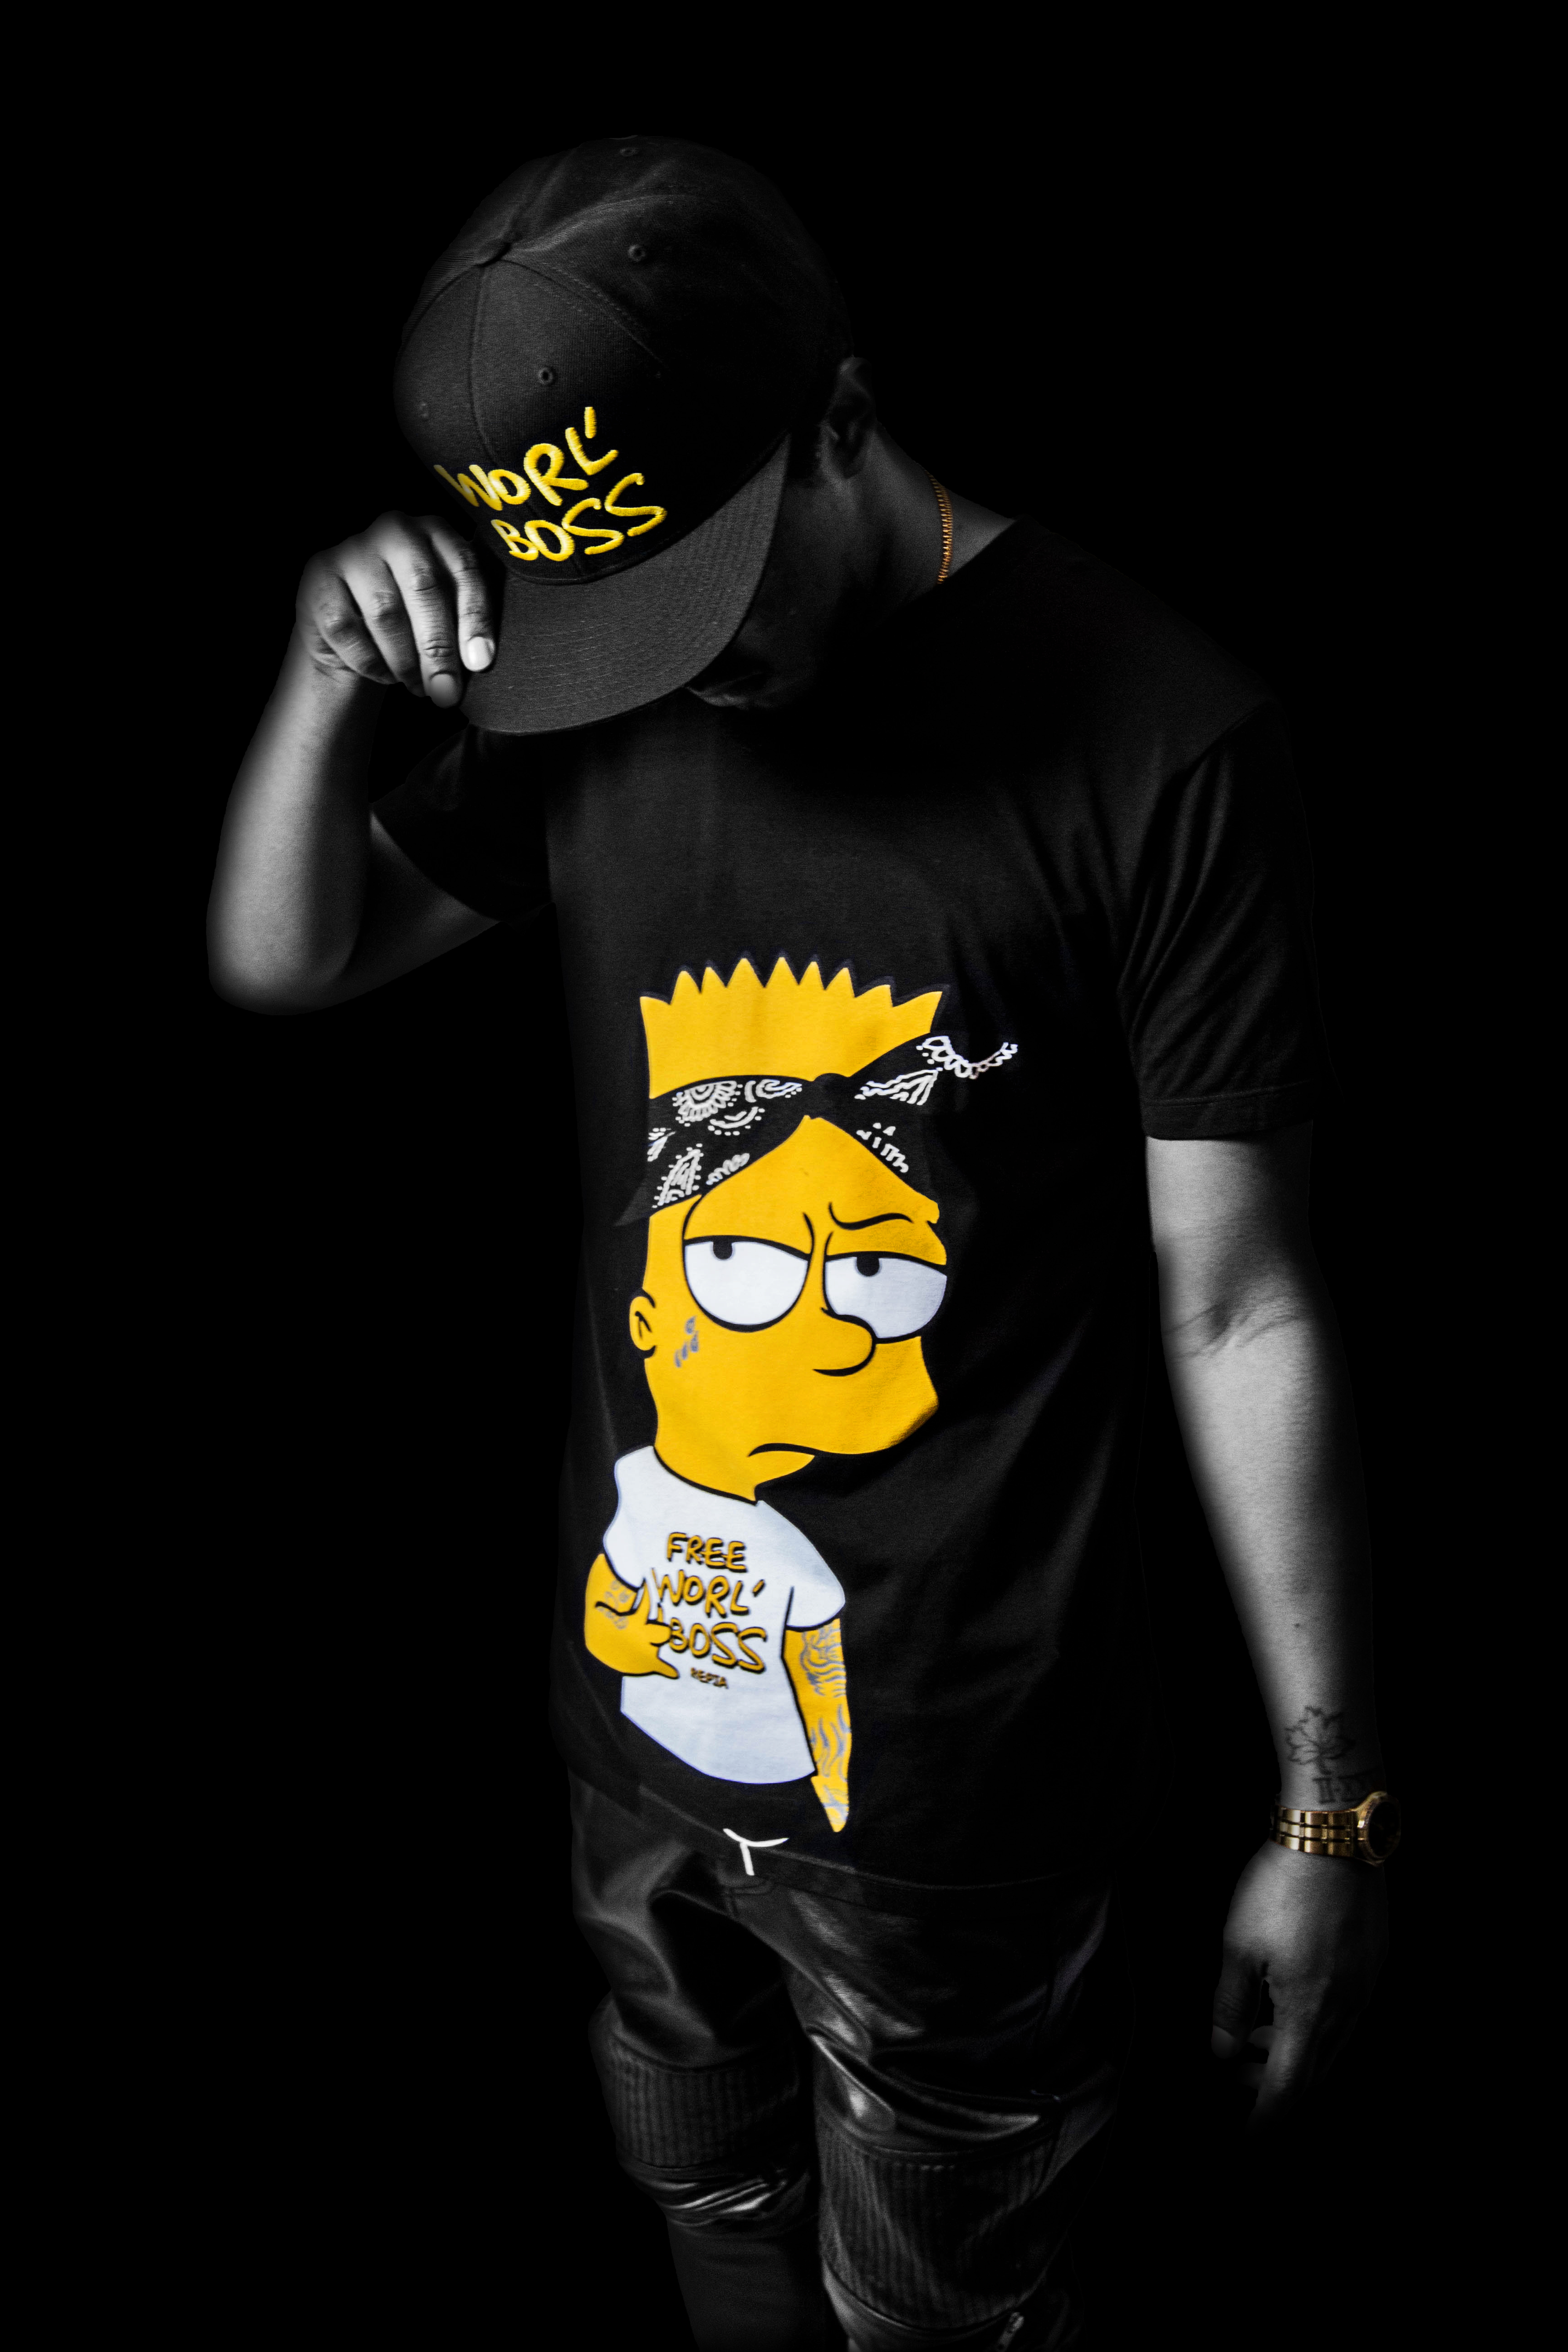 The Simpsons Iphone Wallpaper Fashion Fridays Bart Simpson Vybz Kartel Bartel Largeup